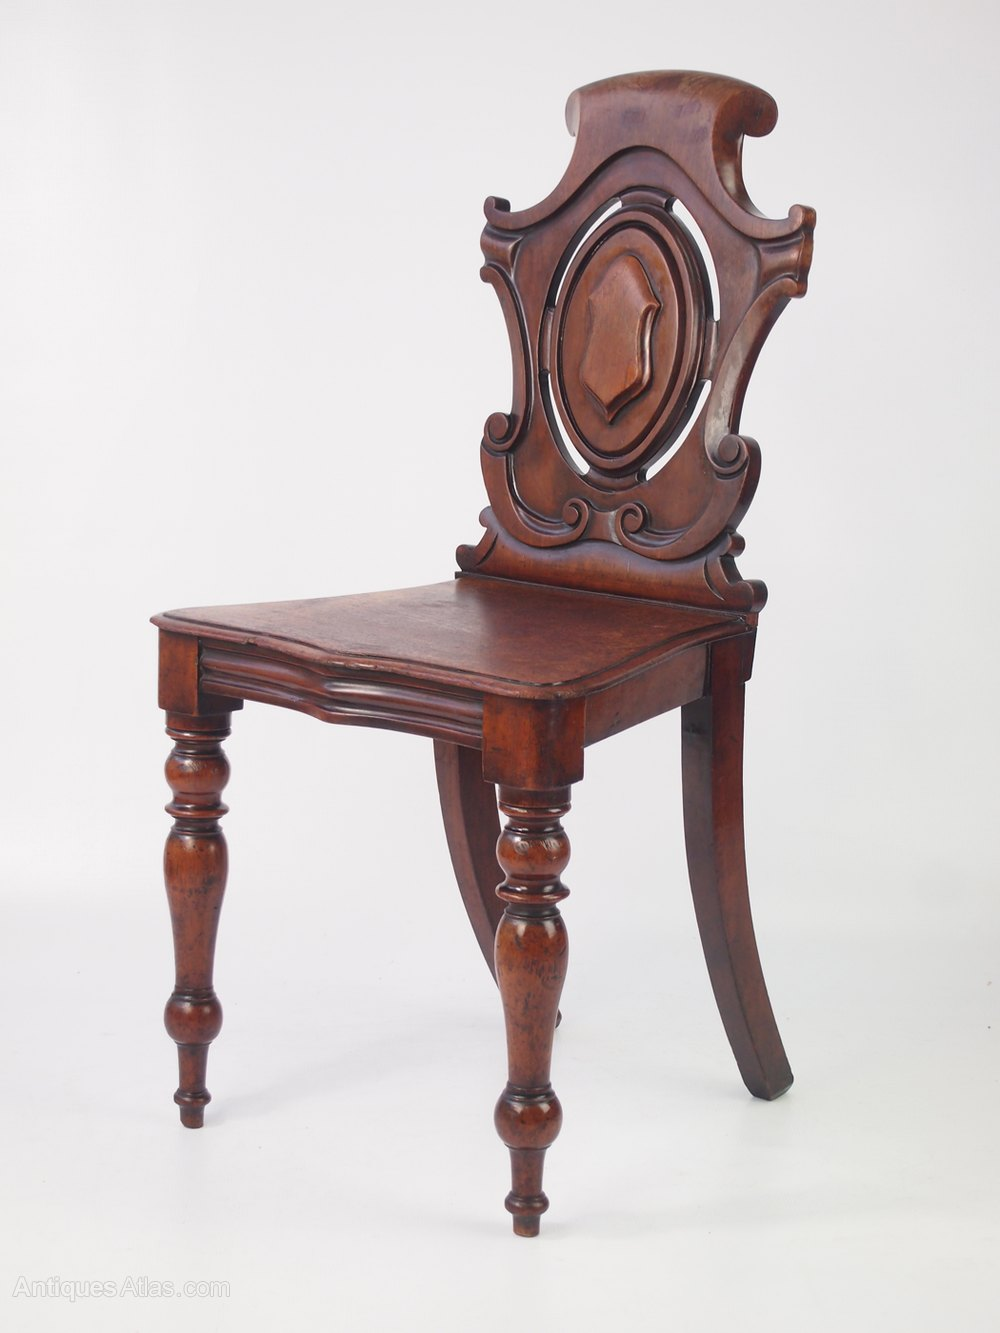 Victorian Mahogany Shield Back Hall Chair Antique Hall Chairs ... - Victorian Mahogany Shield Back Hall Chair - Antiques Atlas